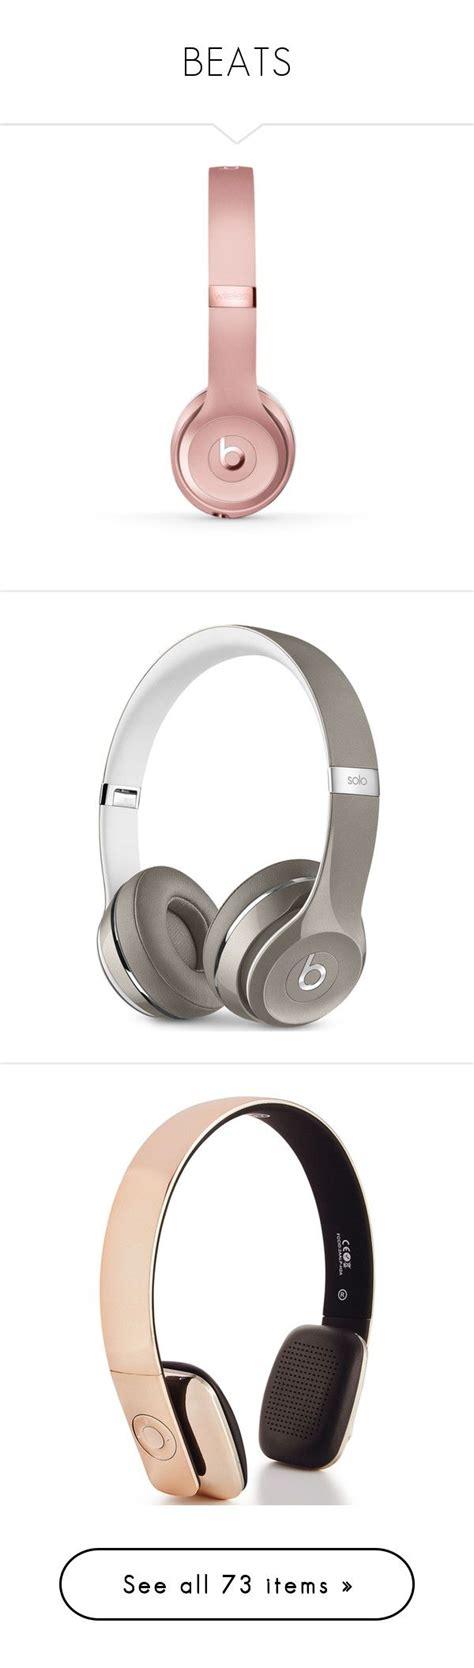 beats by dre headphones earbuds speakers accessories 25 unique wrap headphones ideas on headphone